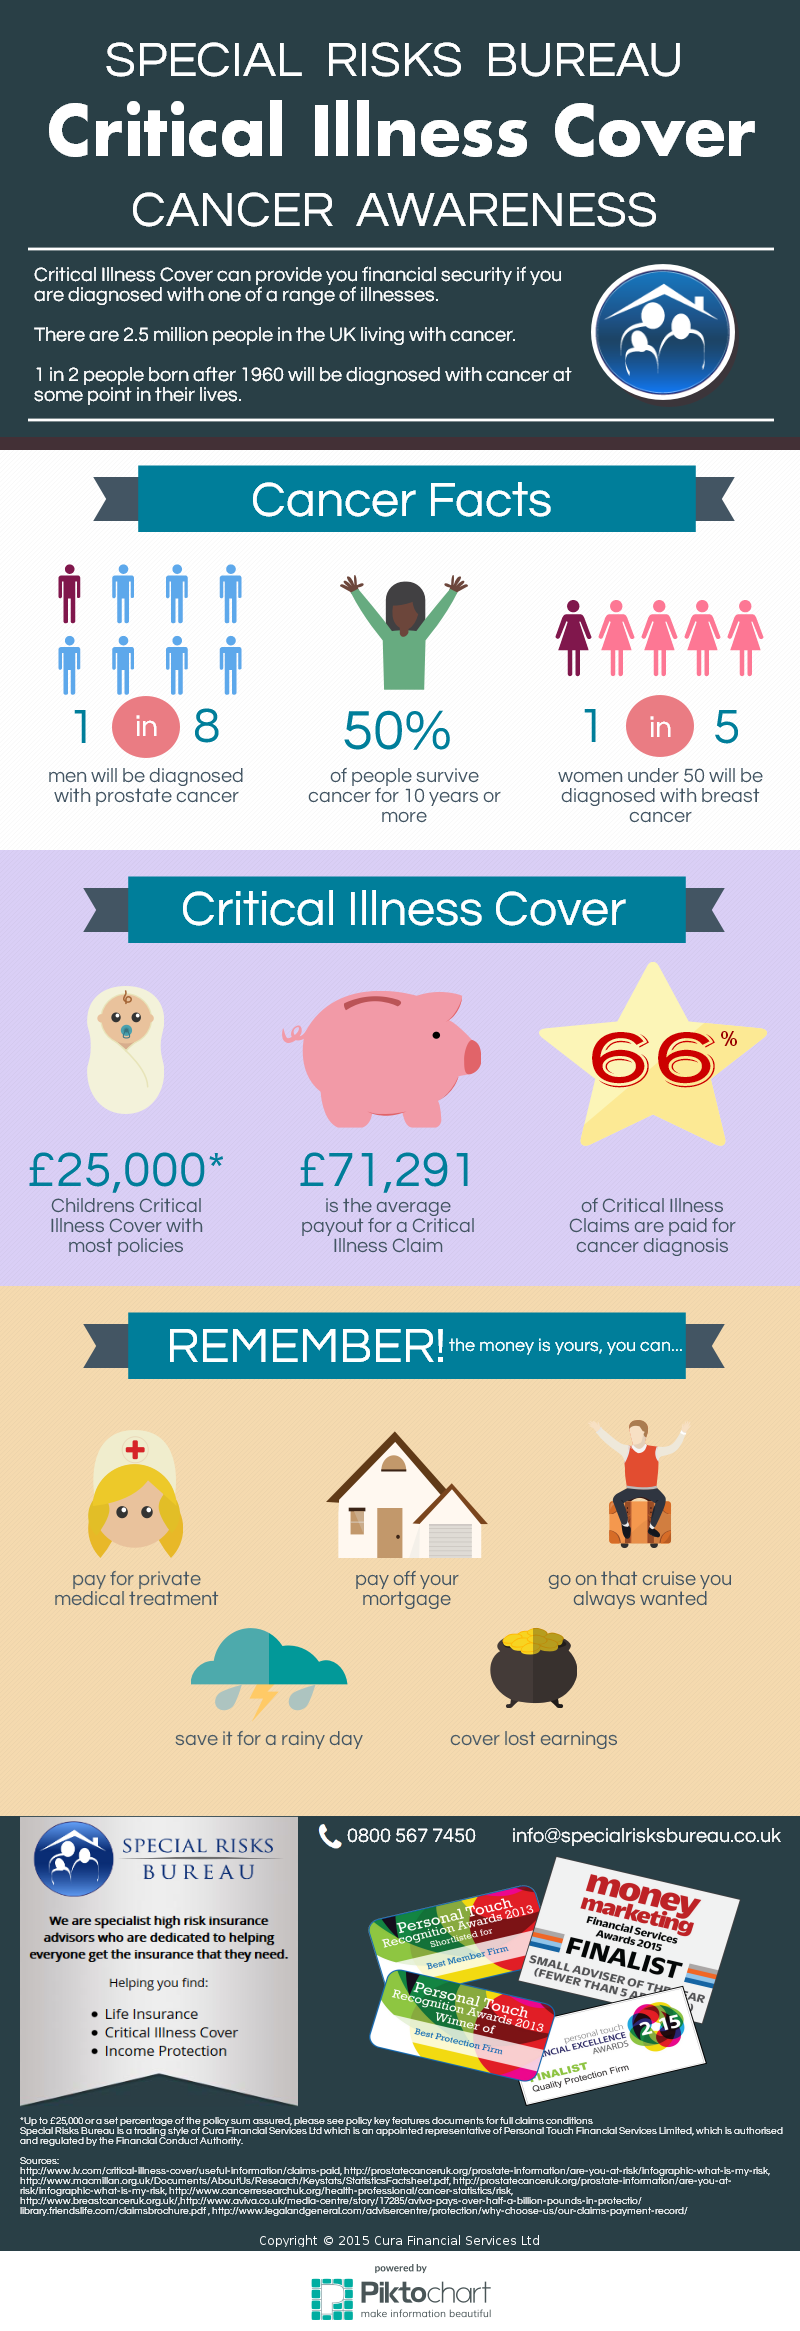 Critical Illness – Cover Cancer